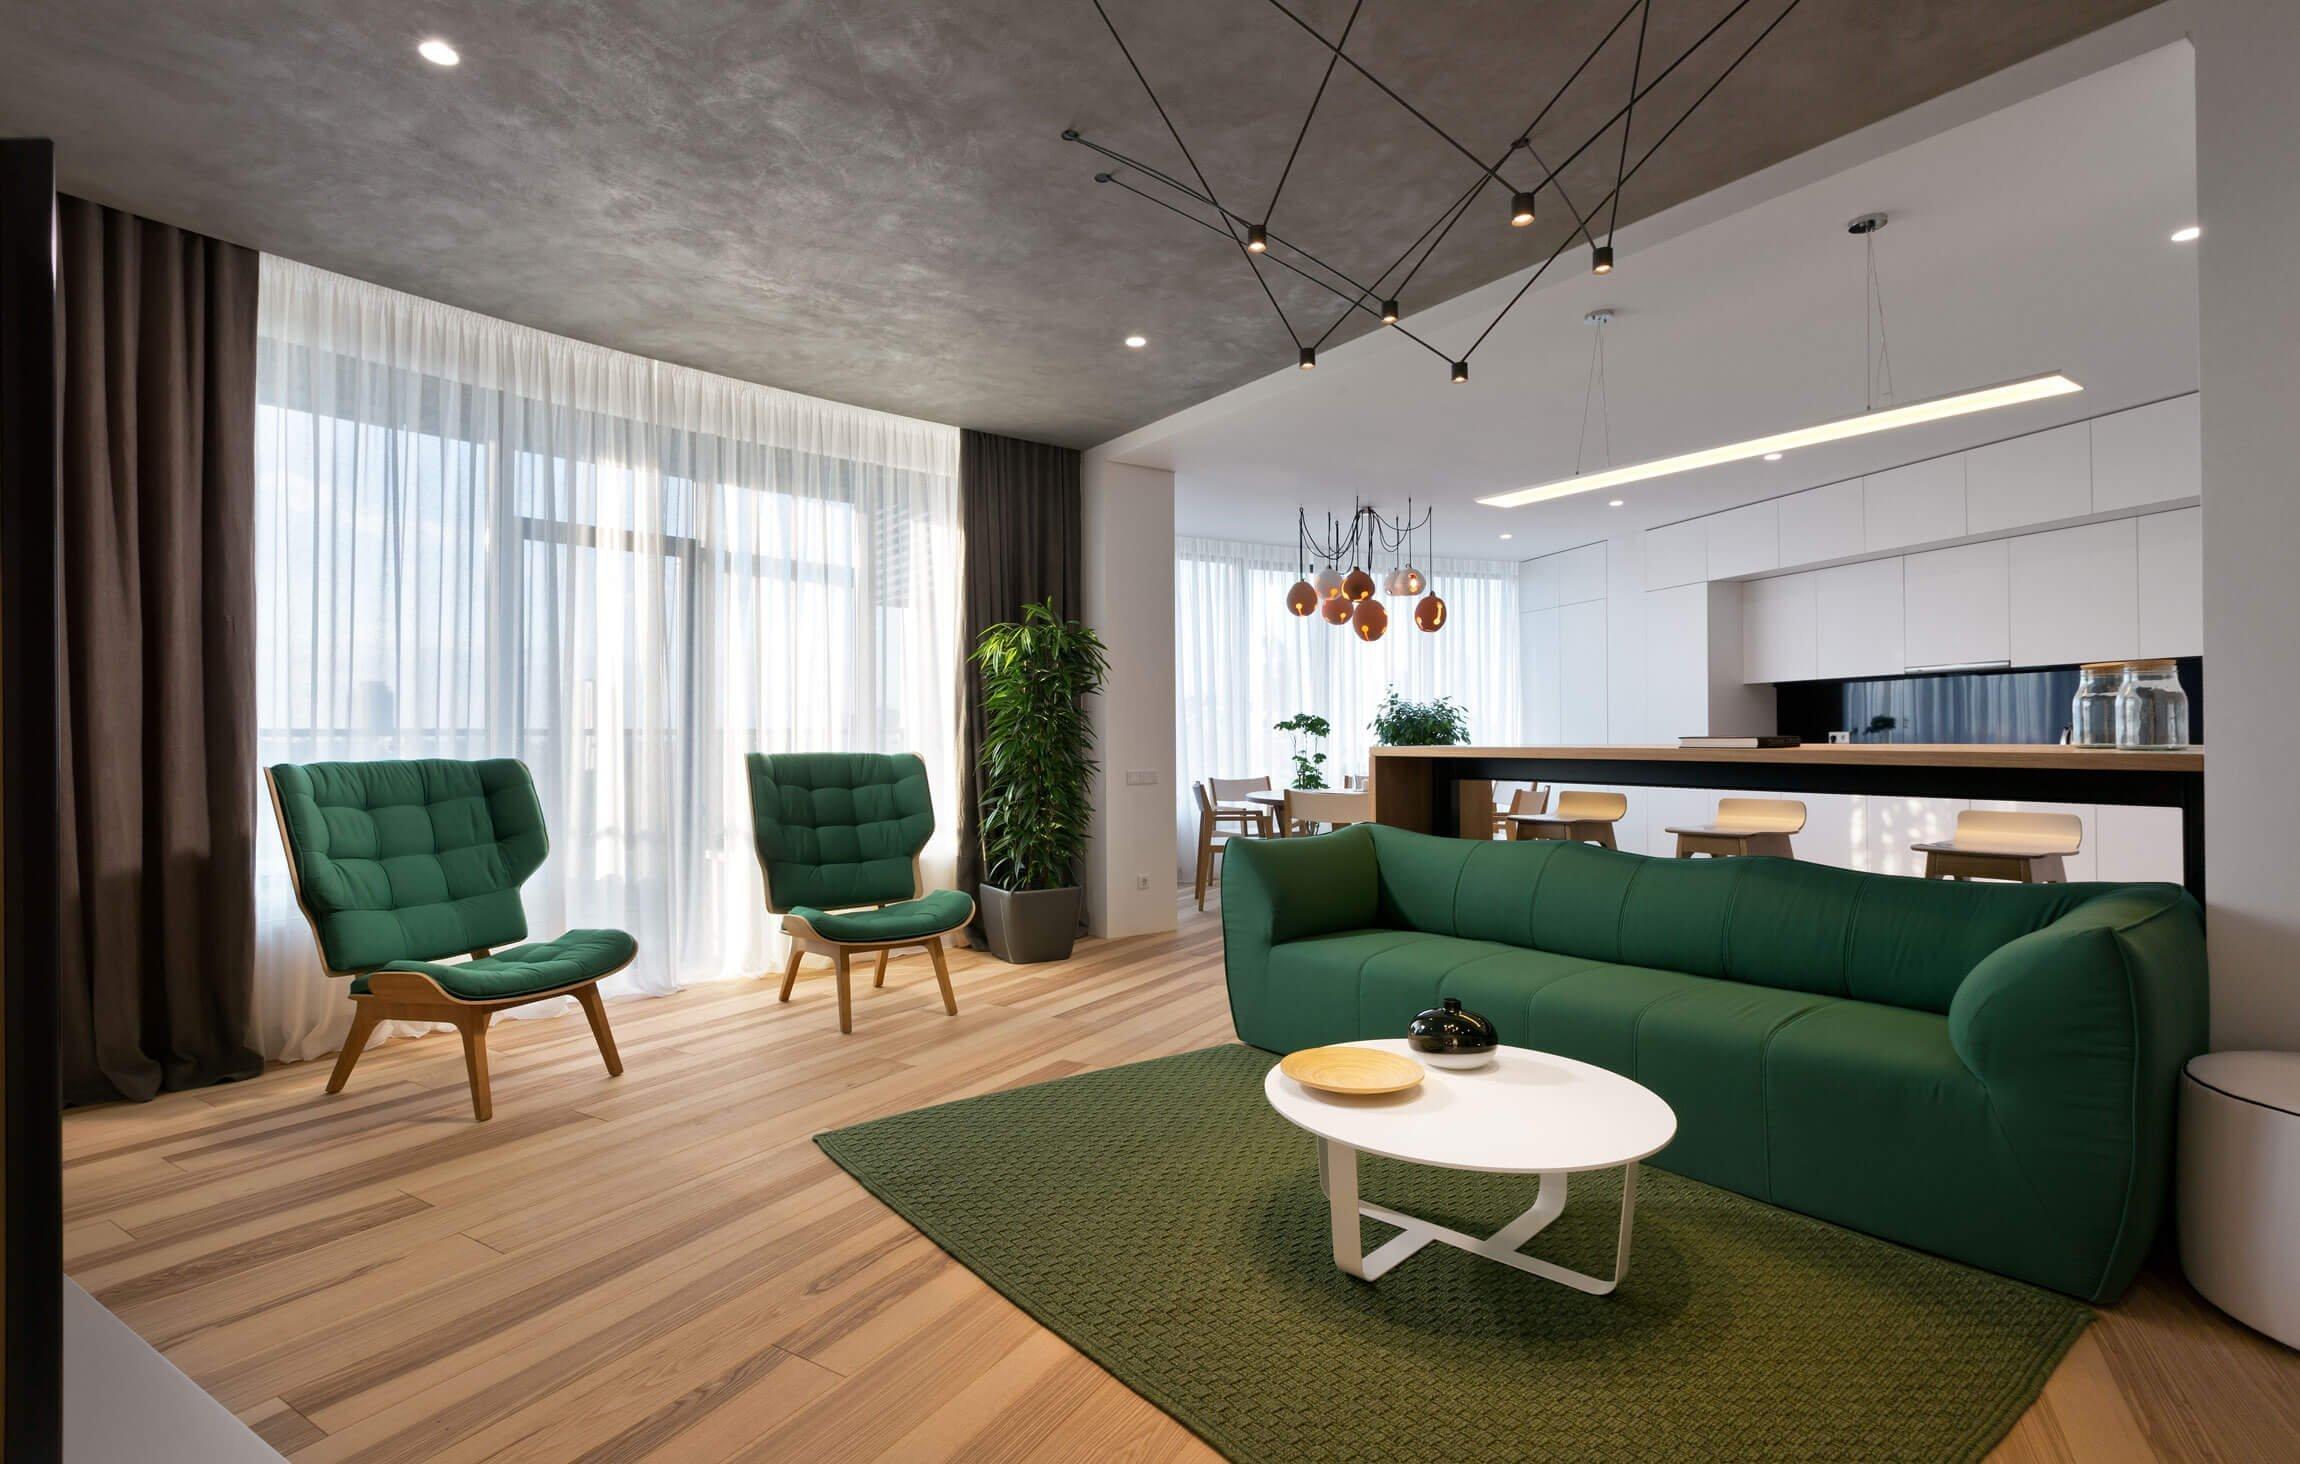 Vzdušný byt v retro a zelené